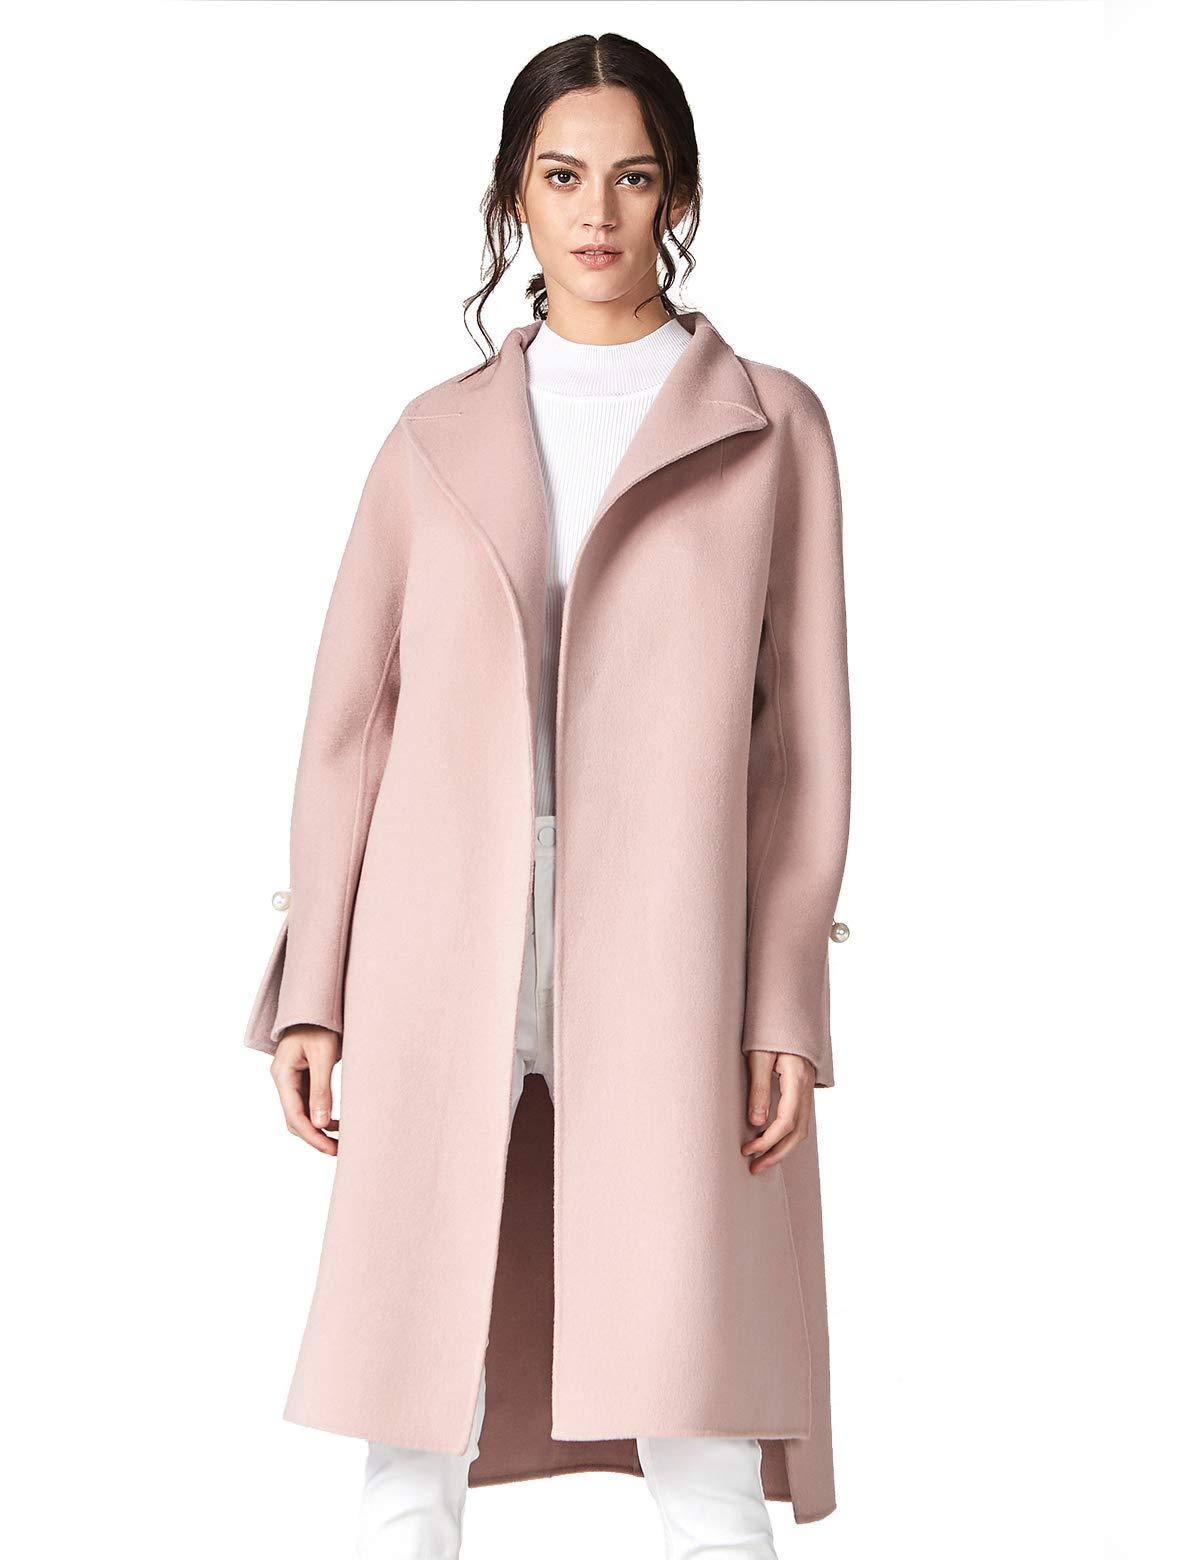 ANNA&CHRIS Women's Long Wool Trench Coat Winter Oversize Handmade Lapel Cardigan Overcoat